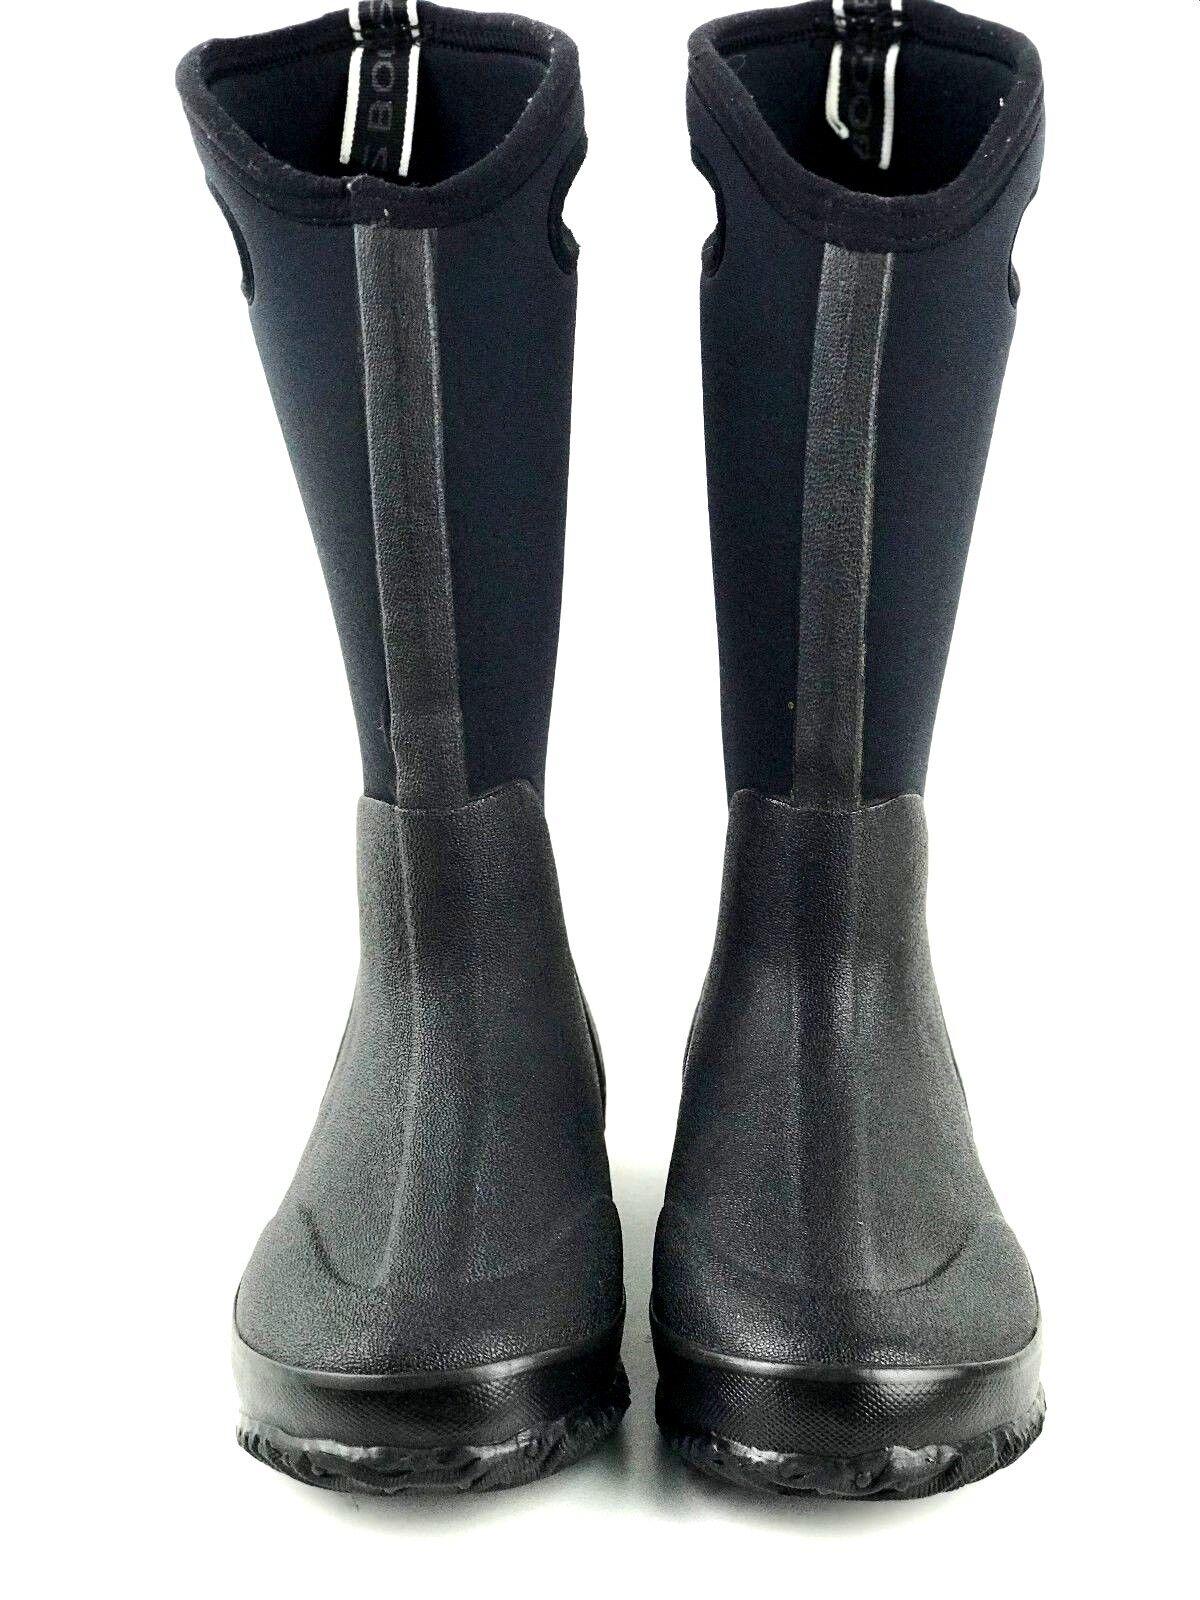 Bogs Clásico Alta maneja 60153 Mujer Negro botas botas botas Talla. US 7 UK 5 EU 37.5  ordenar ahora